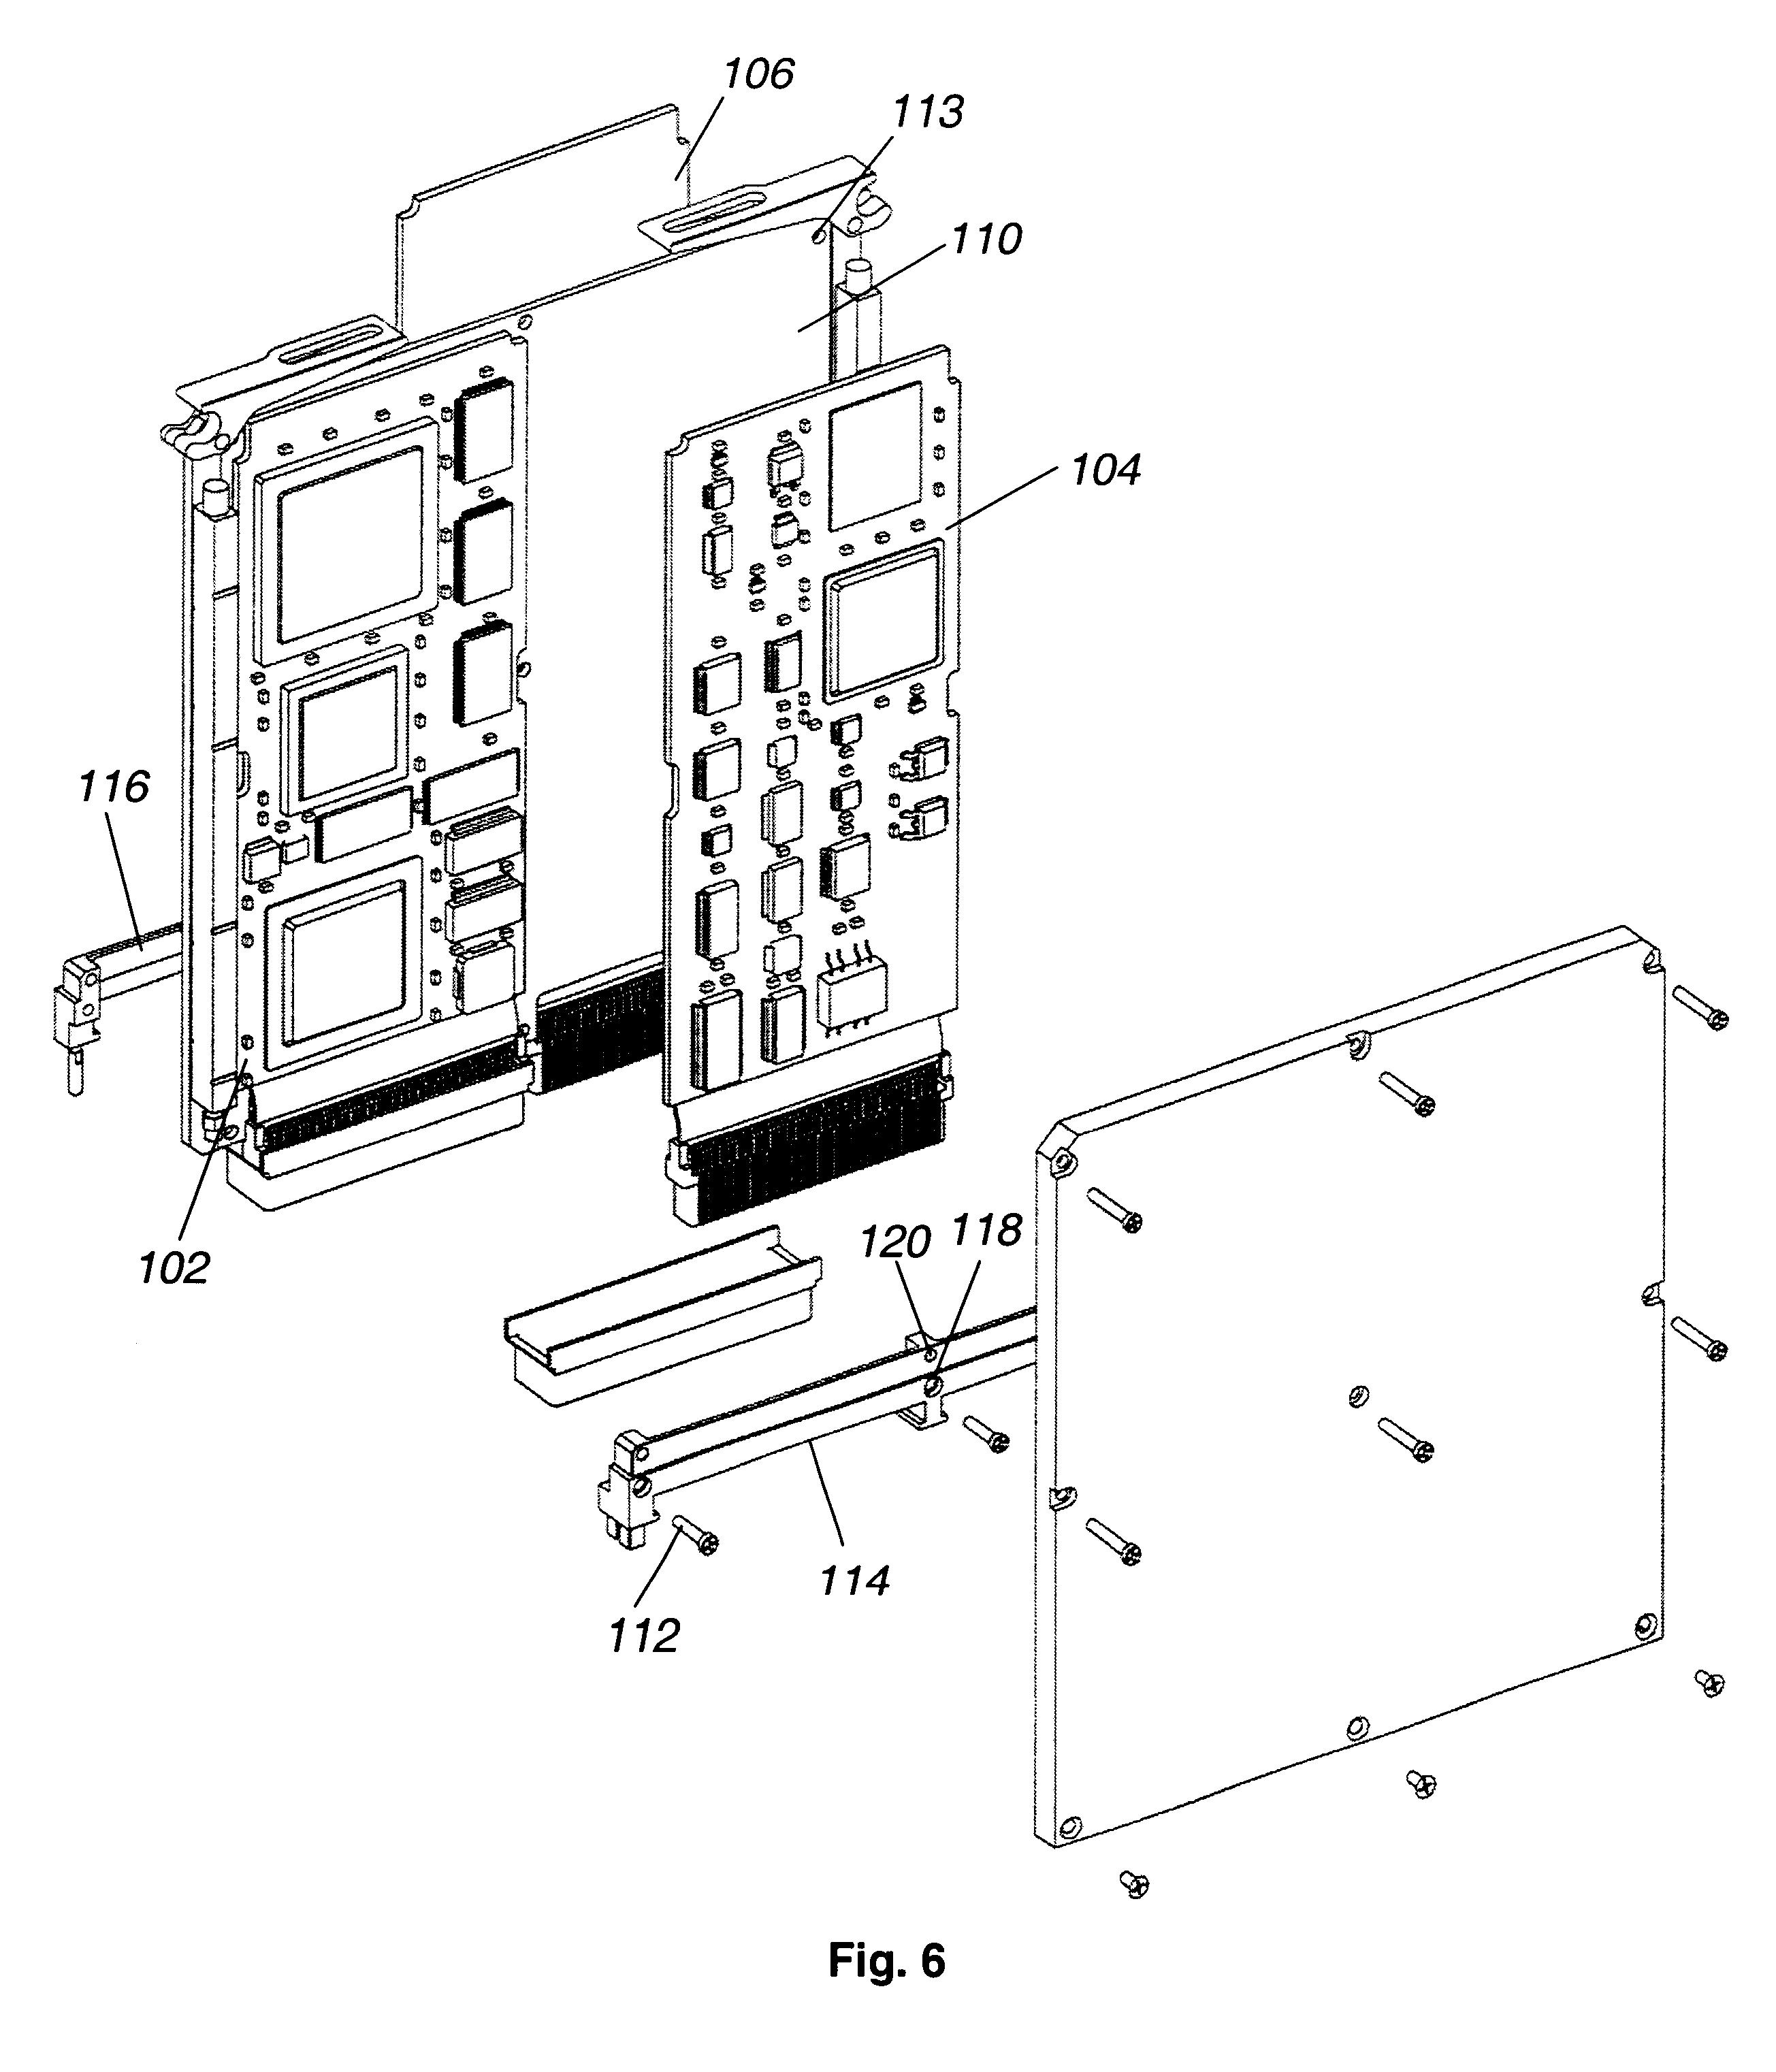 patent us6320750 - sub-modular configurable avionics